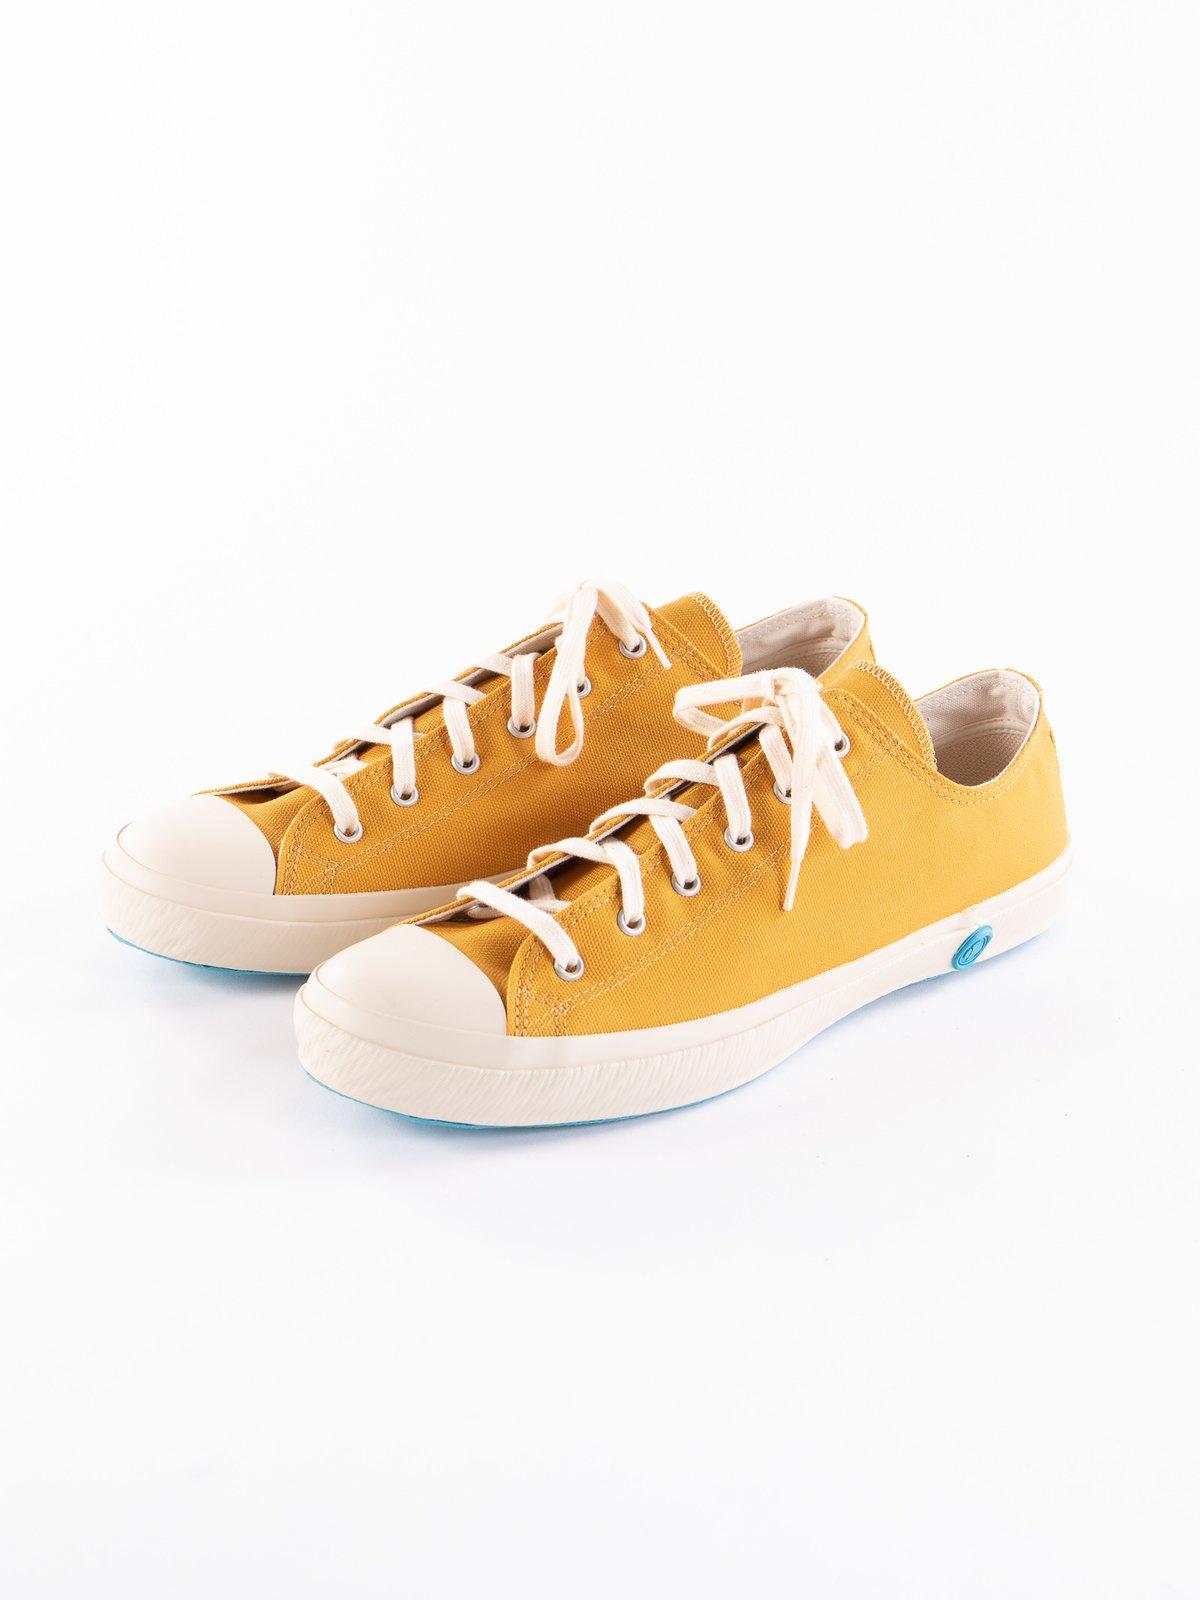 Mustard 01JP Low Trainer - Image 2